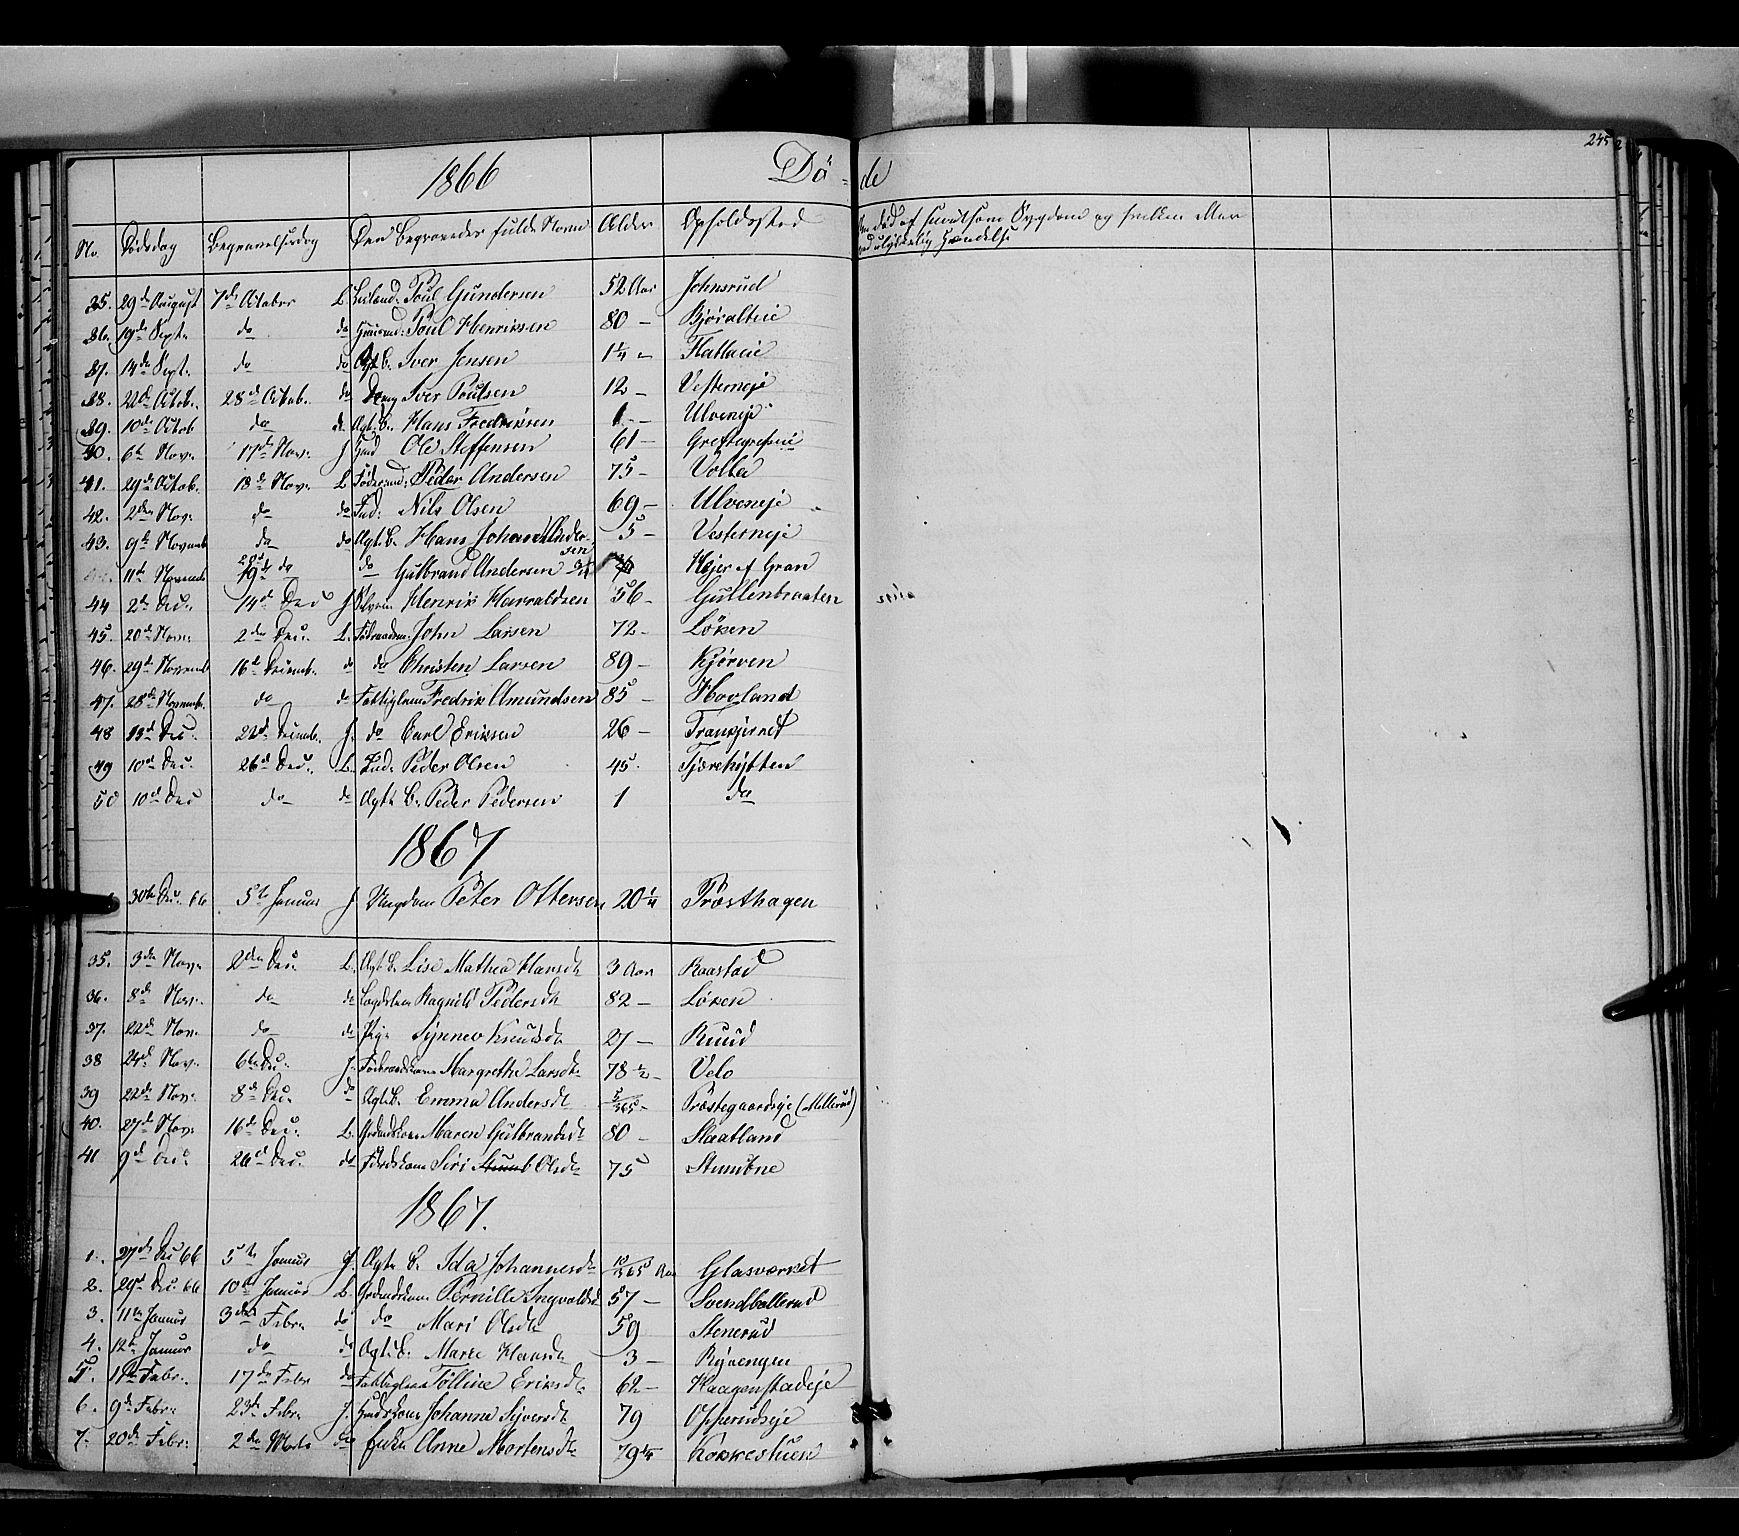 SAH, Jevnaker prestekontor, Ministerialbok nr. 7, 1858-1876, s. 245